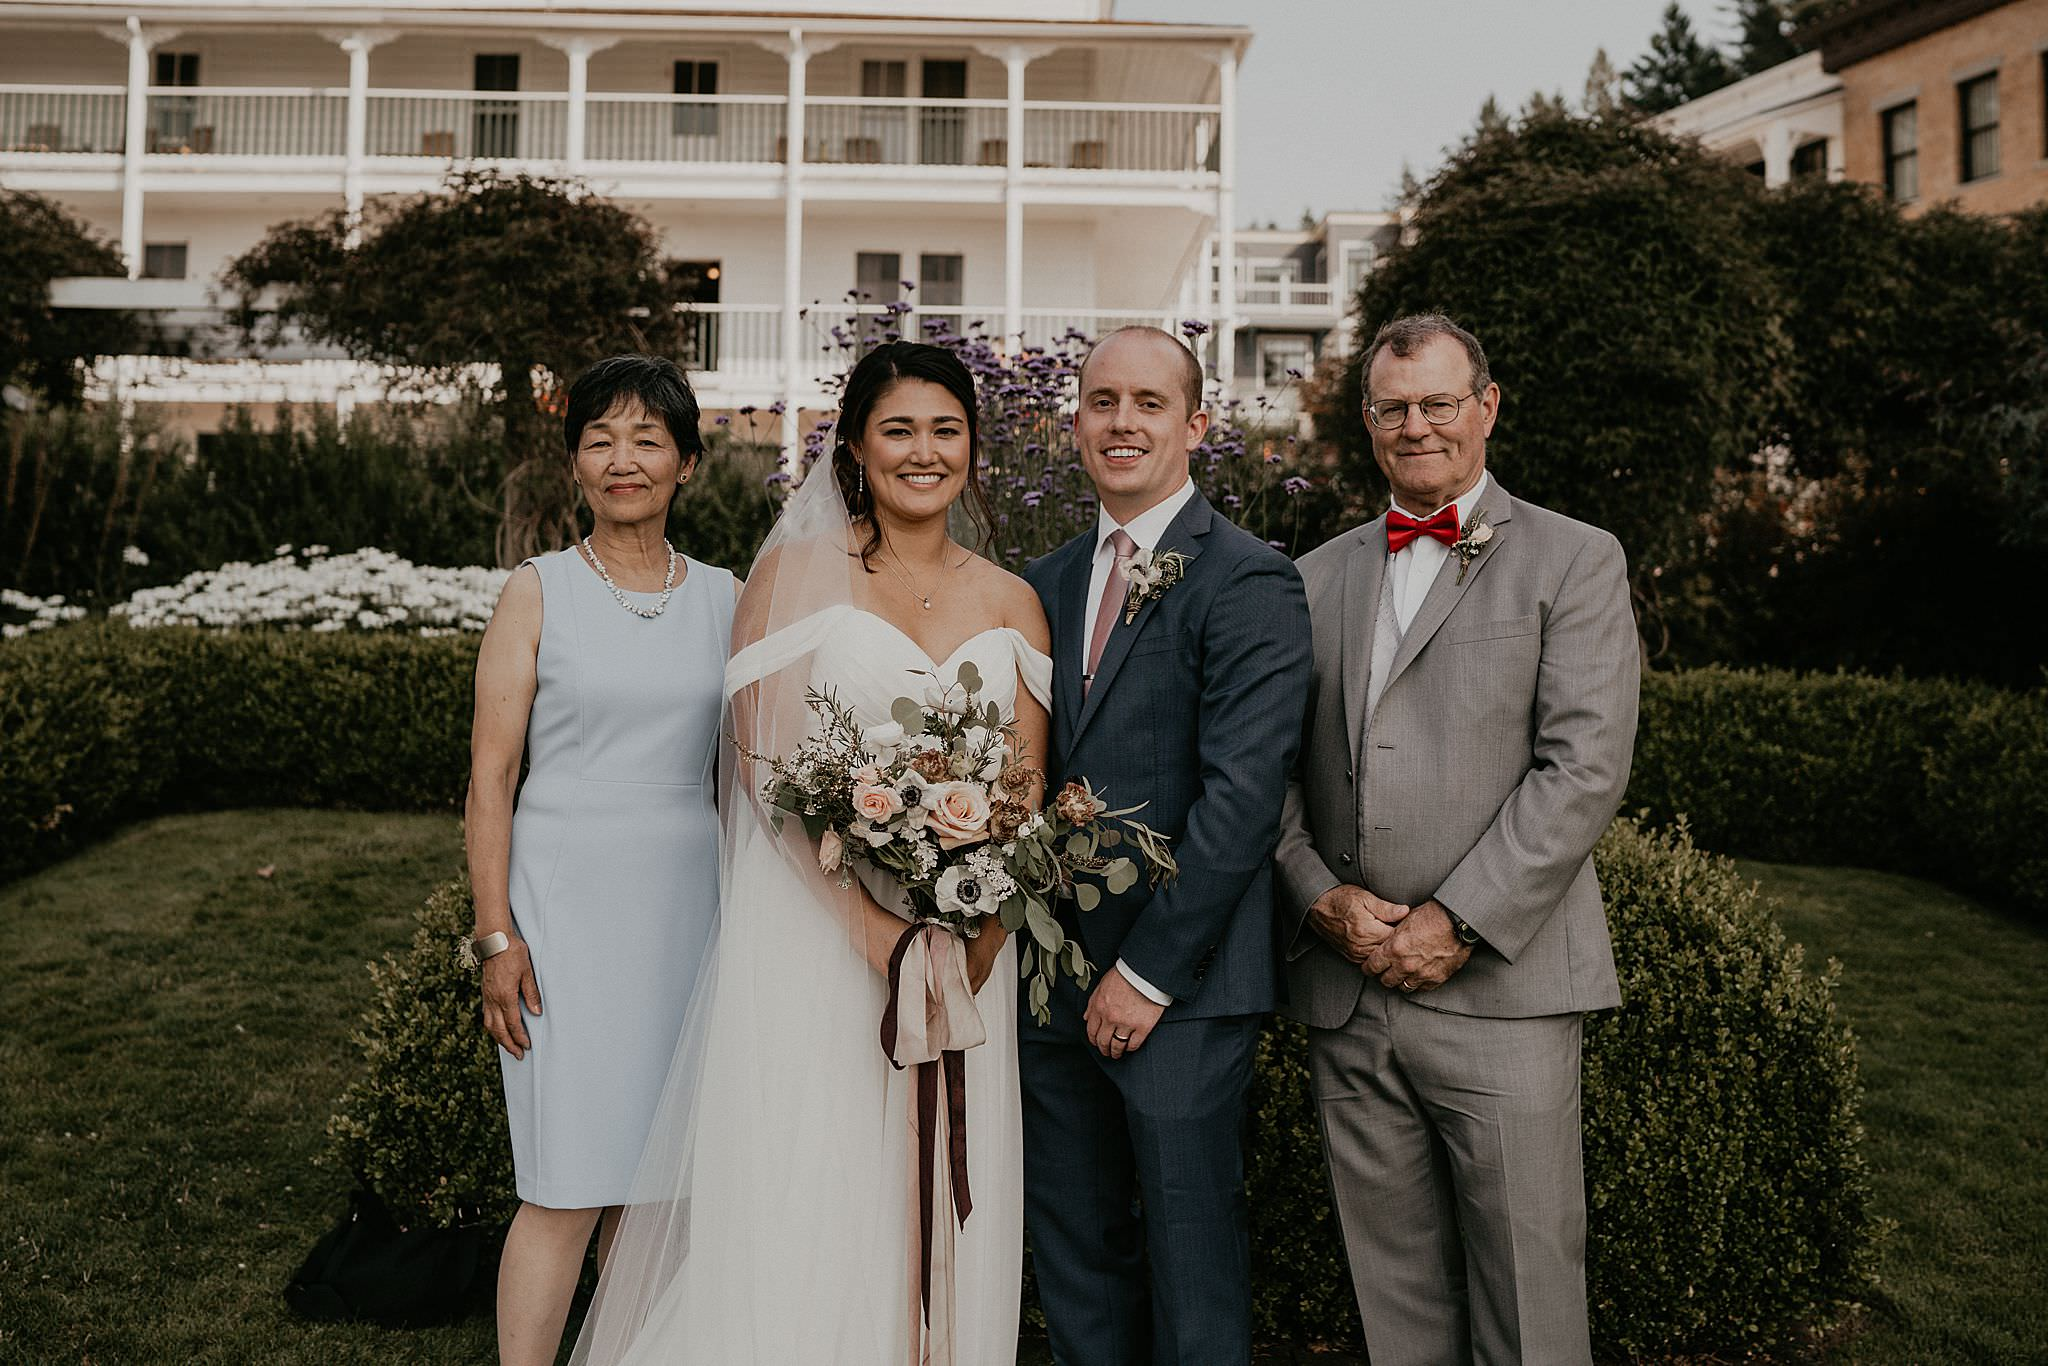 roche-harbor-wedding-san-juans-island-washington_0089.jpg